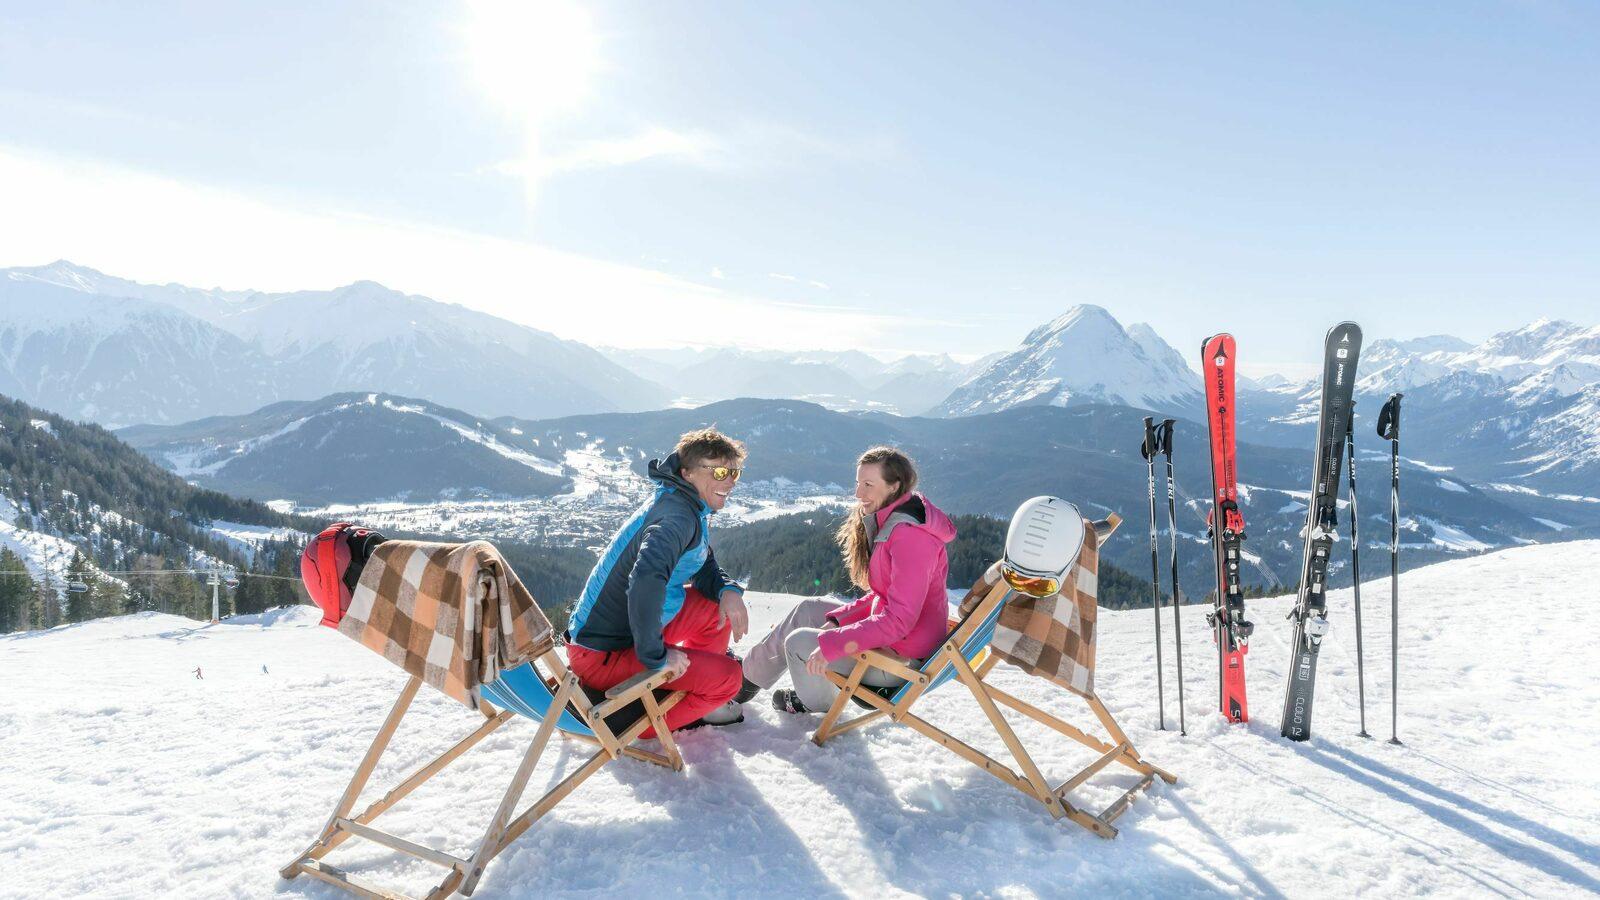 Luxus Ski Urlaub Tirol